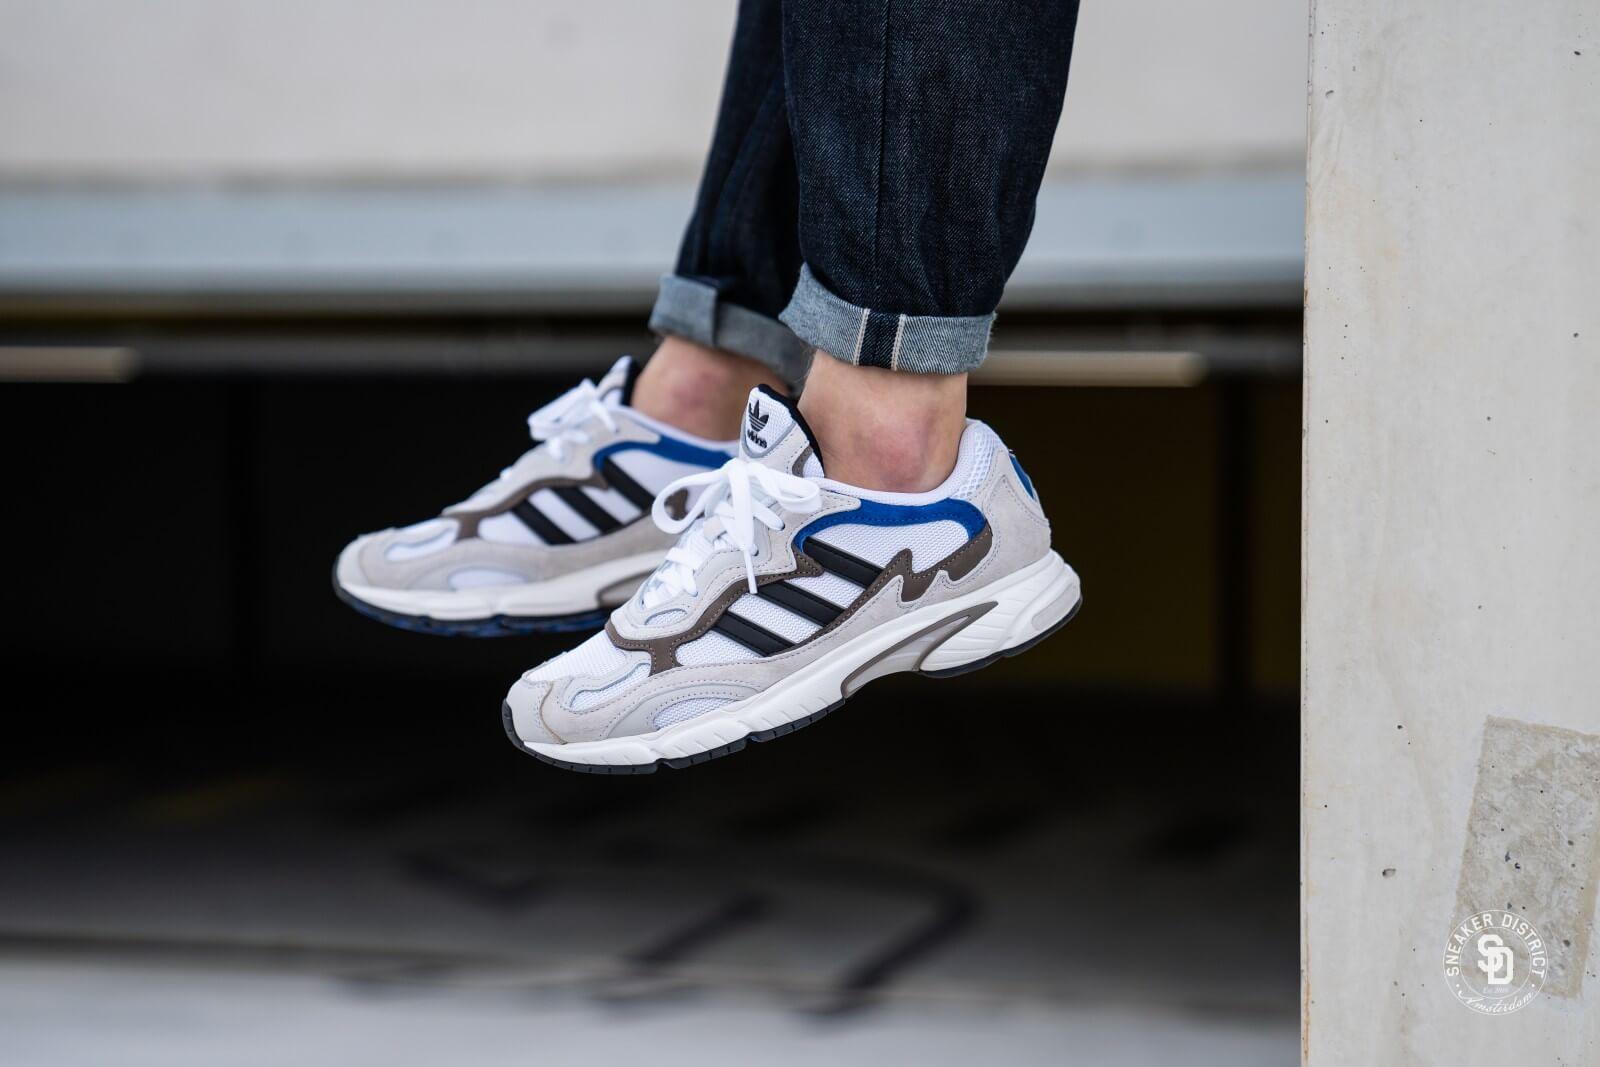 Flexible vendedor Permanecer  Adidas Temper Run Footwear White/Core Black - EE7737